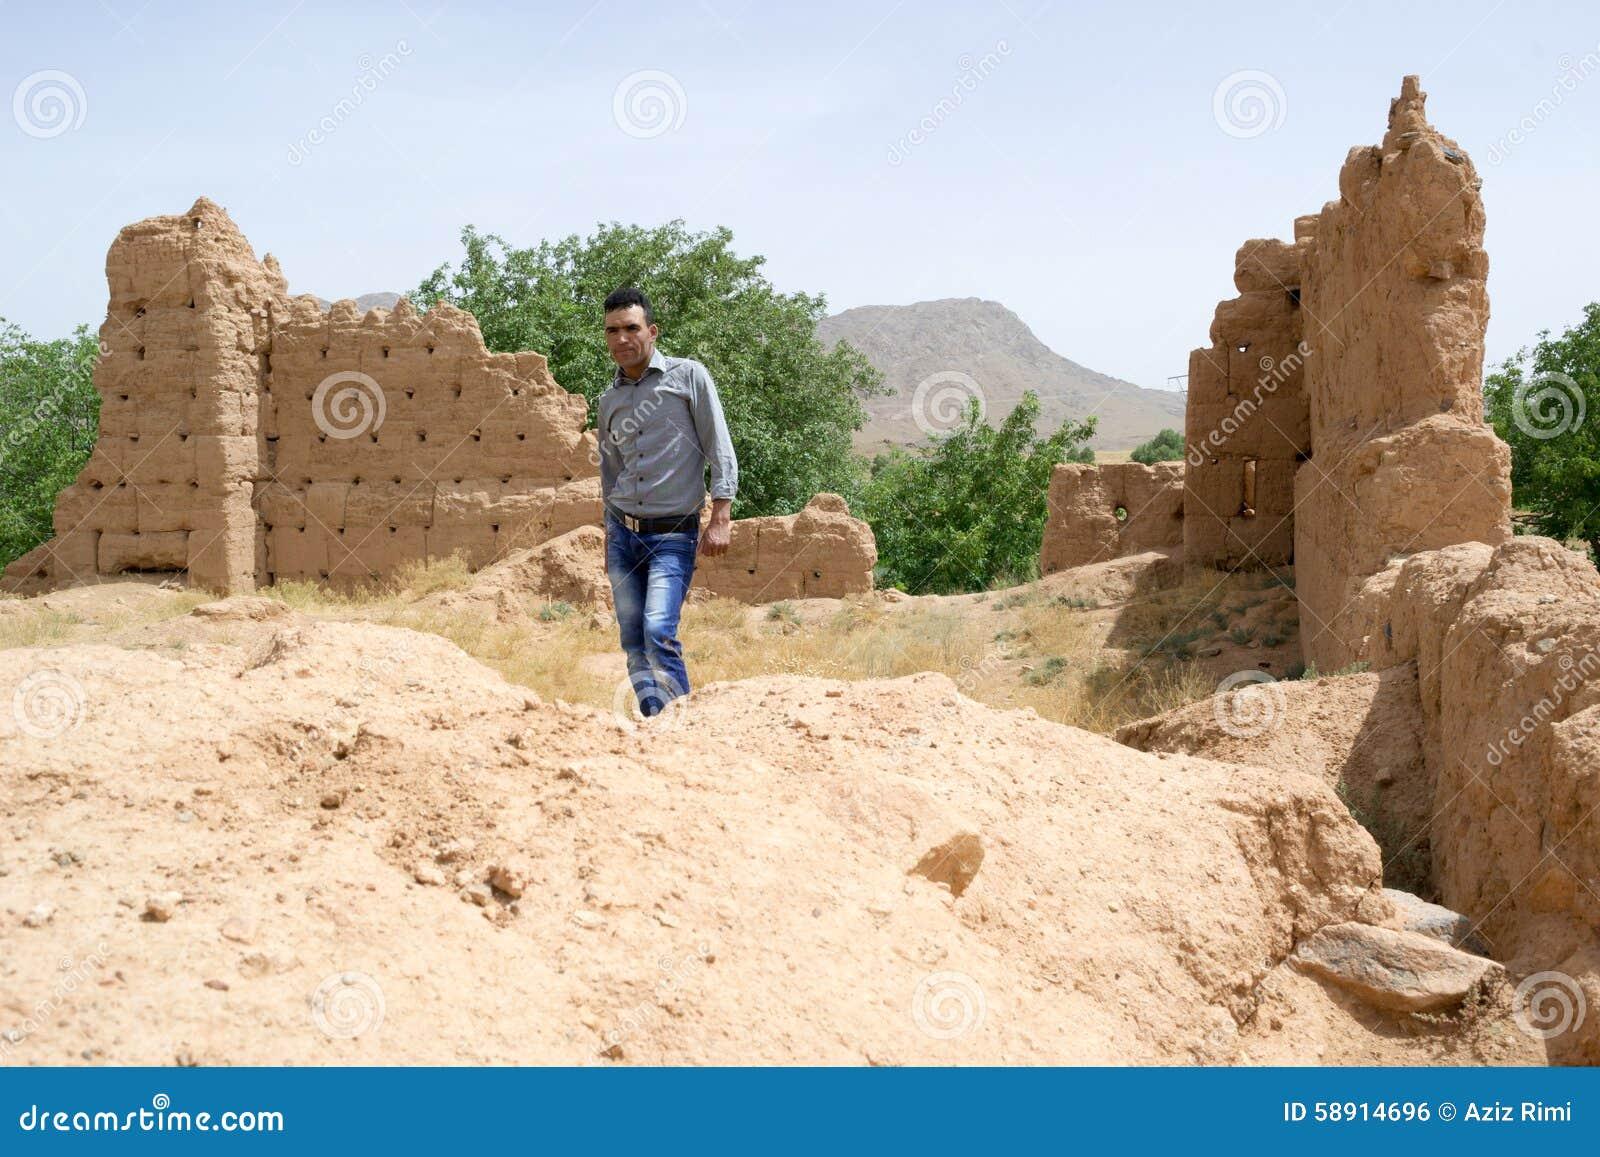 Man visiting a historical ruins site